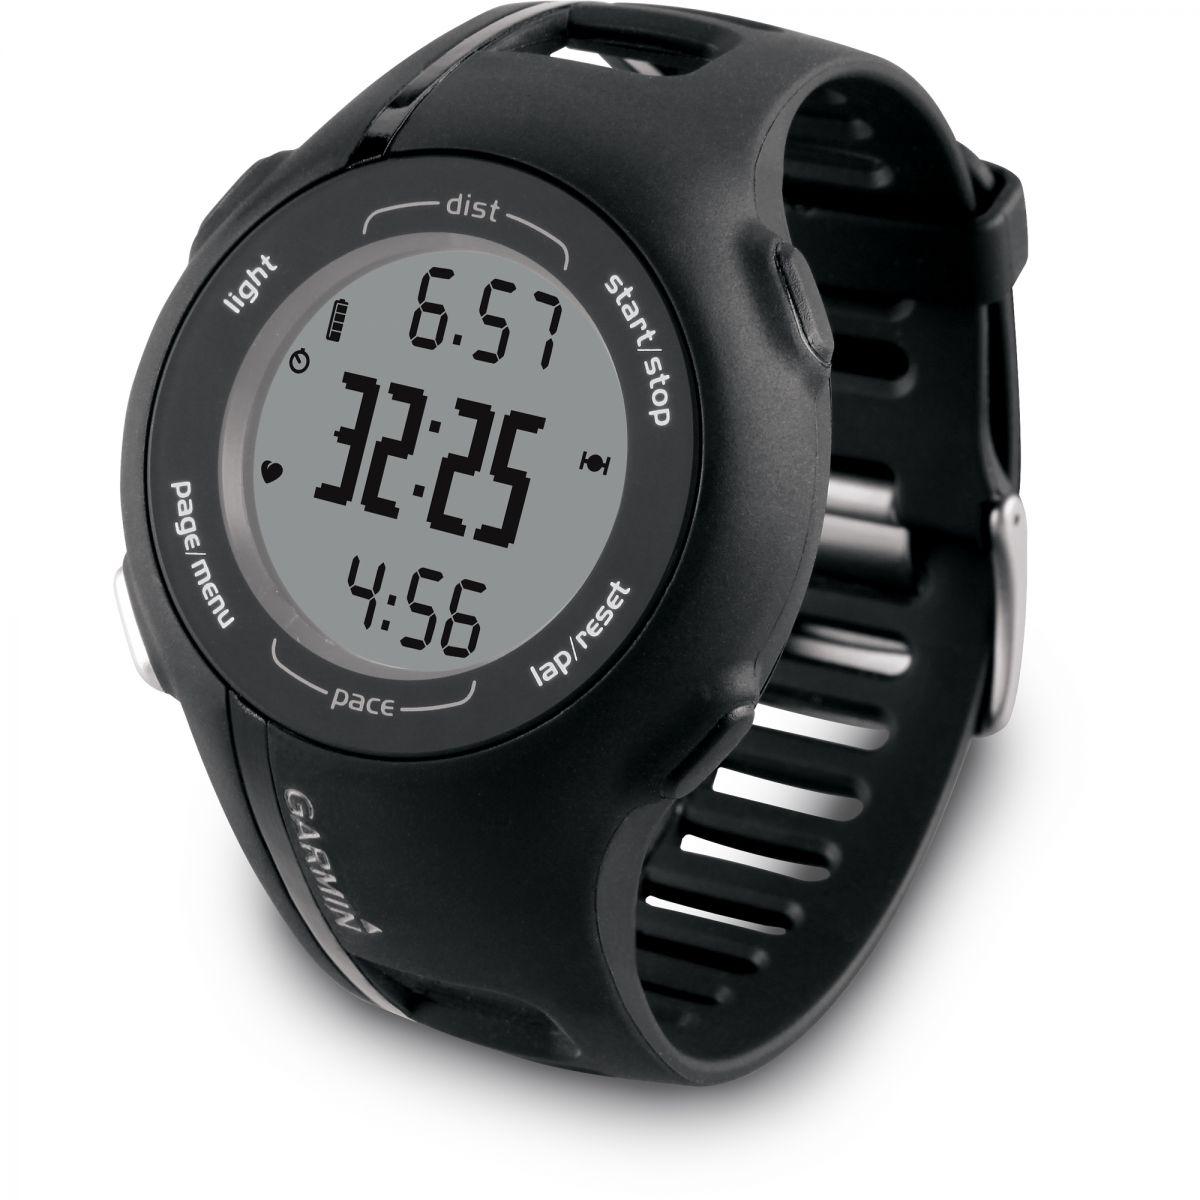 unisex garmin forerunner 210 gps heart rate monitor alarm rh watchshop com manual forerunner 210 español Garmin 110